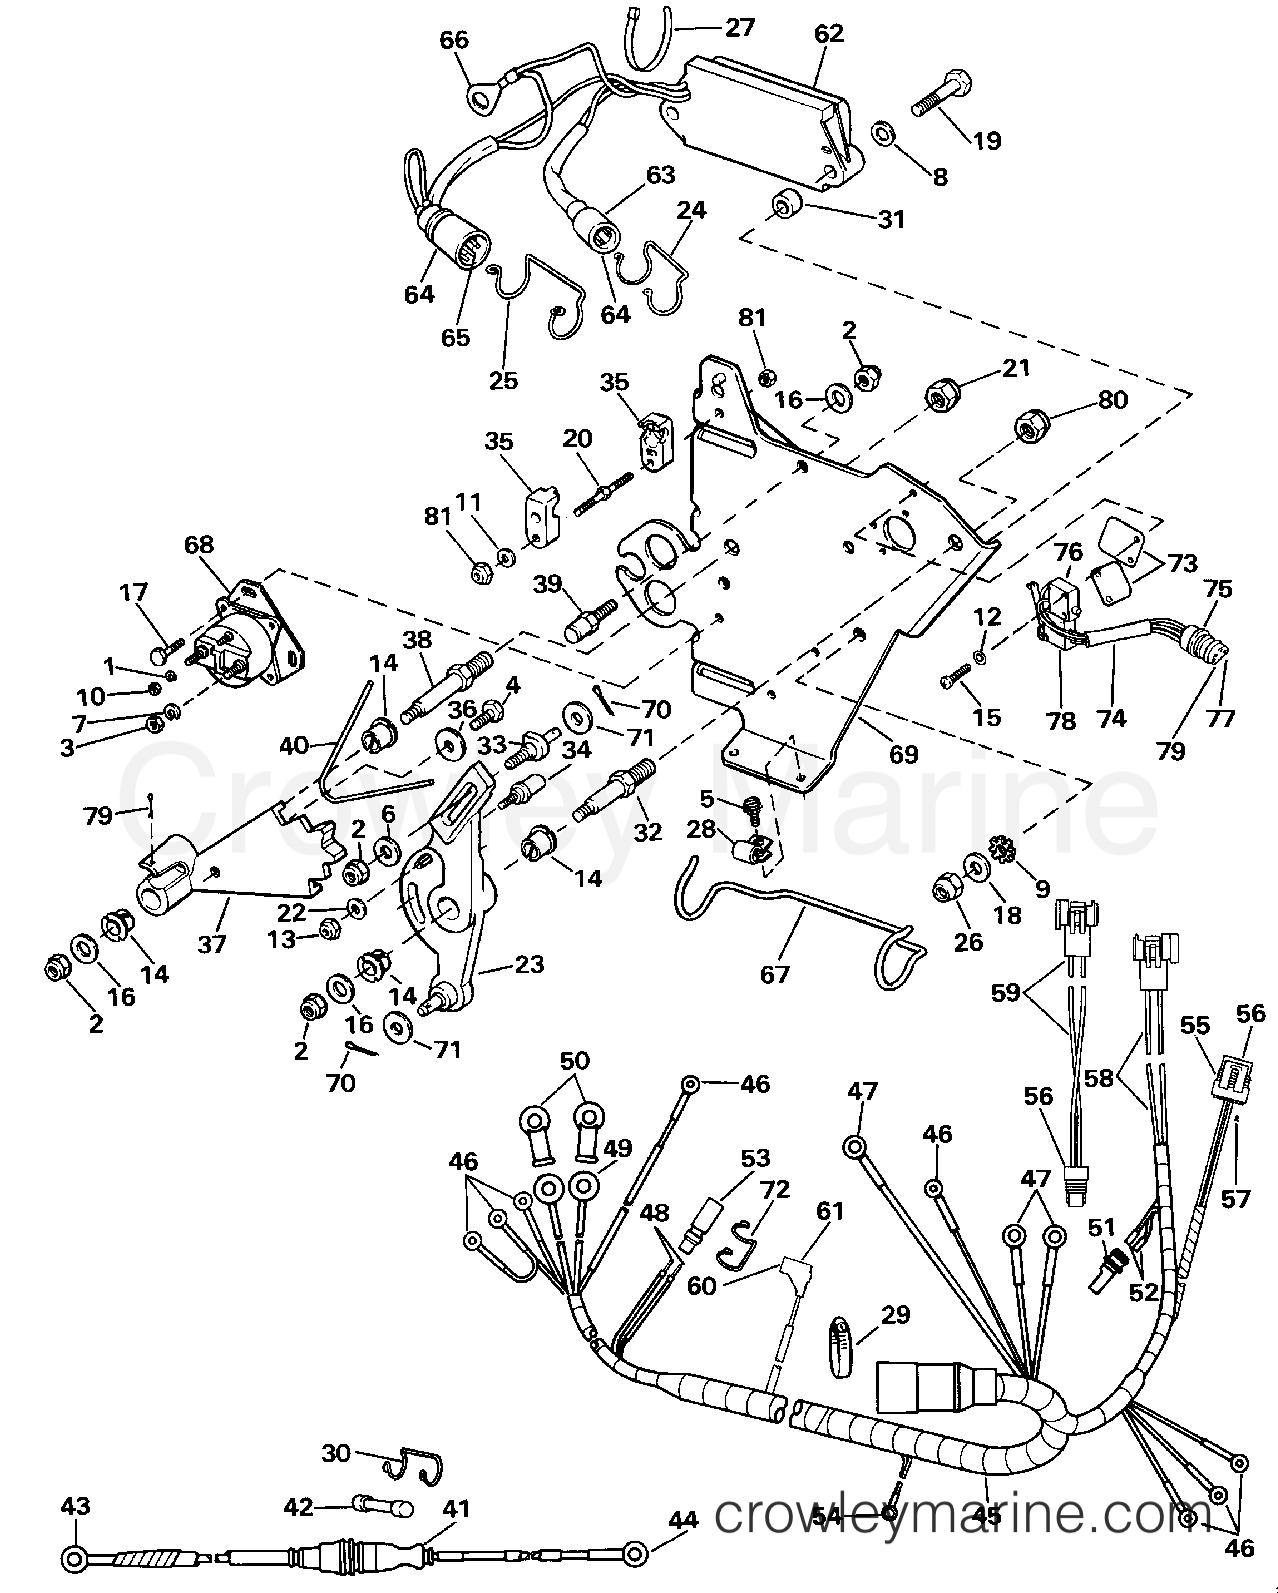 rj61x wiring diagram fuse box \u0026 wiring diagramrj61x wiring diagram  wiring diagramrj61 jack wiring diagram